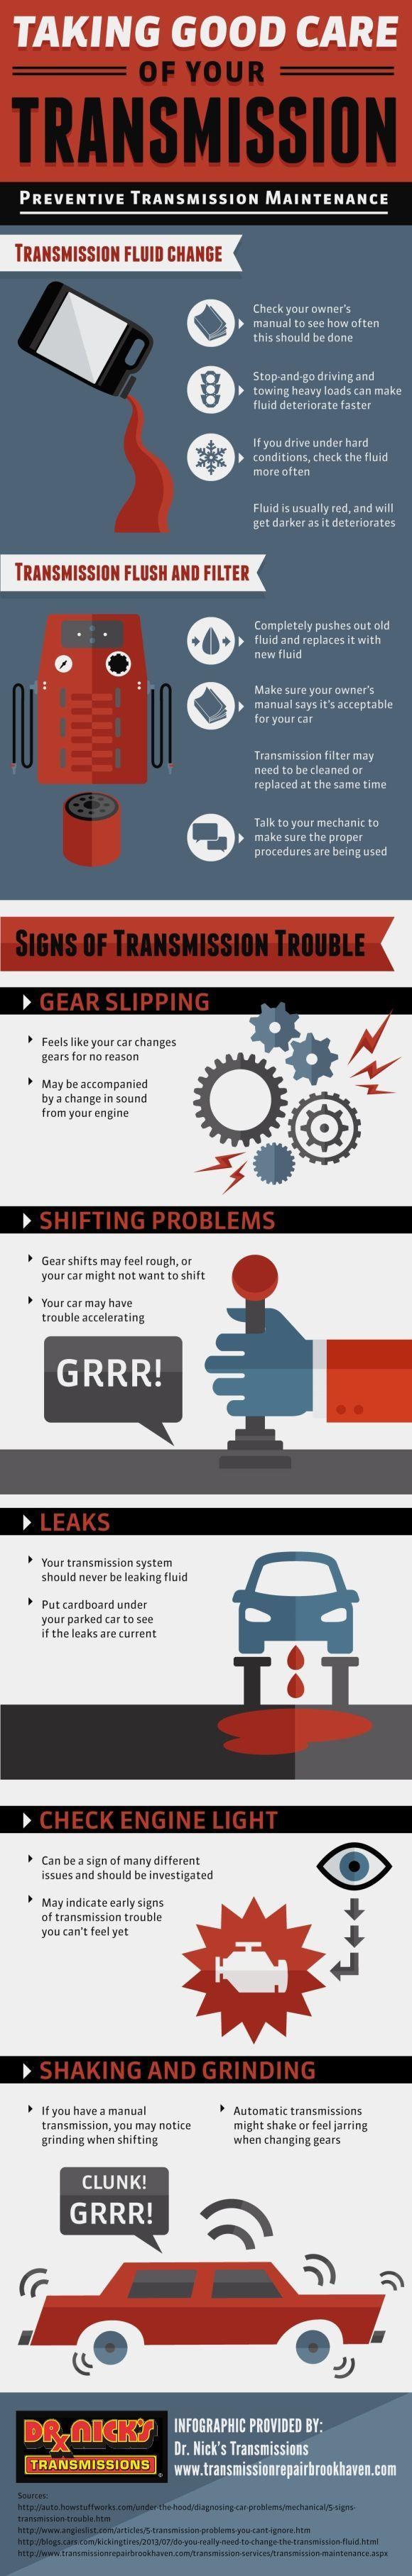 how often should you change manual transmission fluid